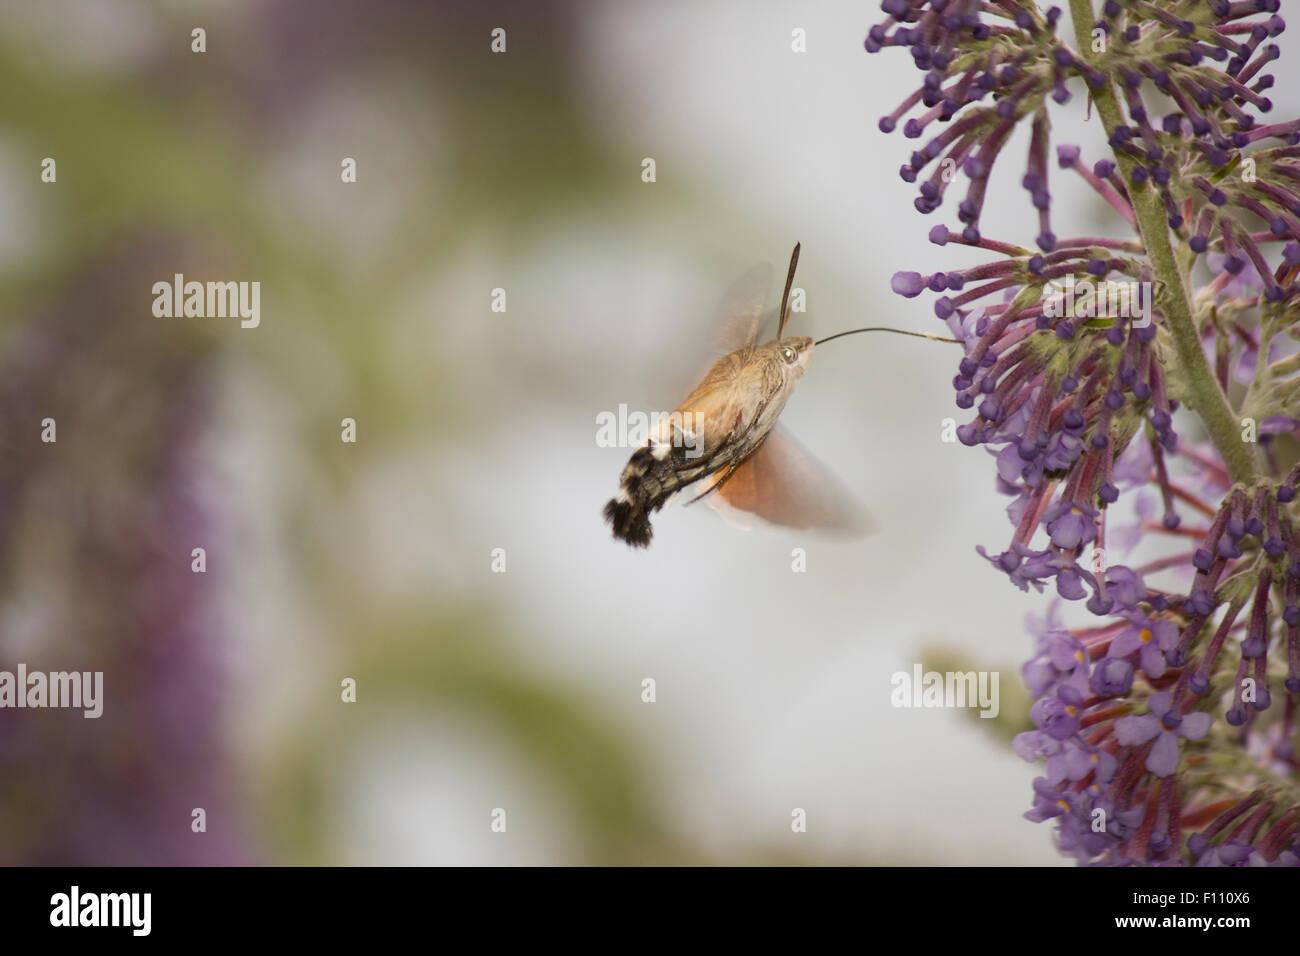 Hummingbird hawk-moth feeding on buddleia - Stock Image